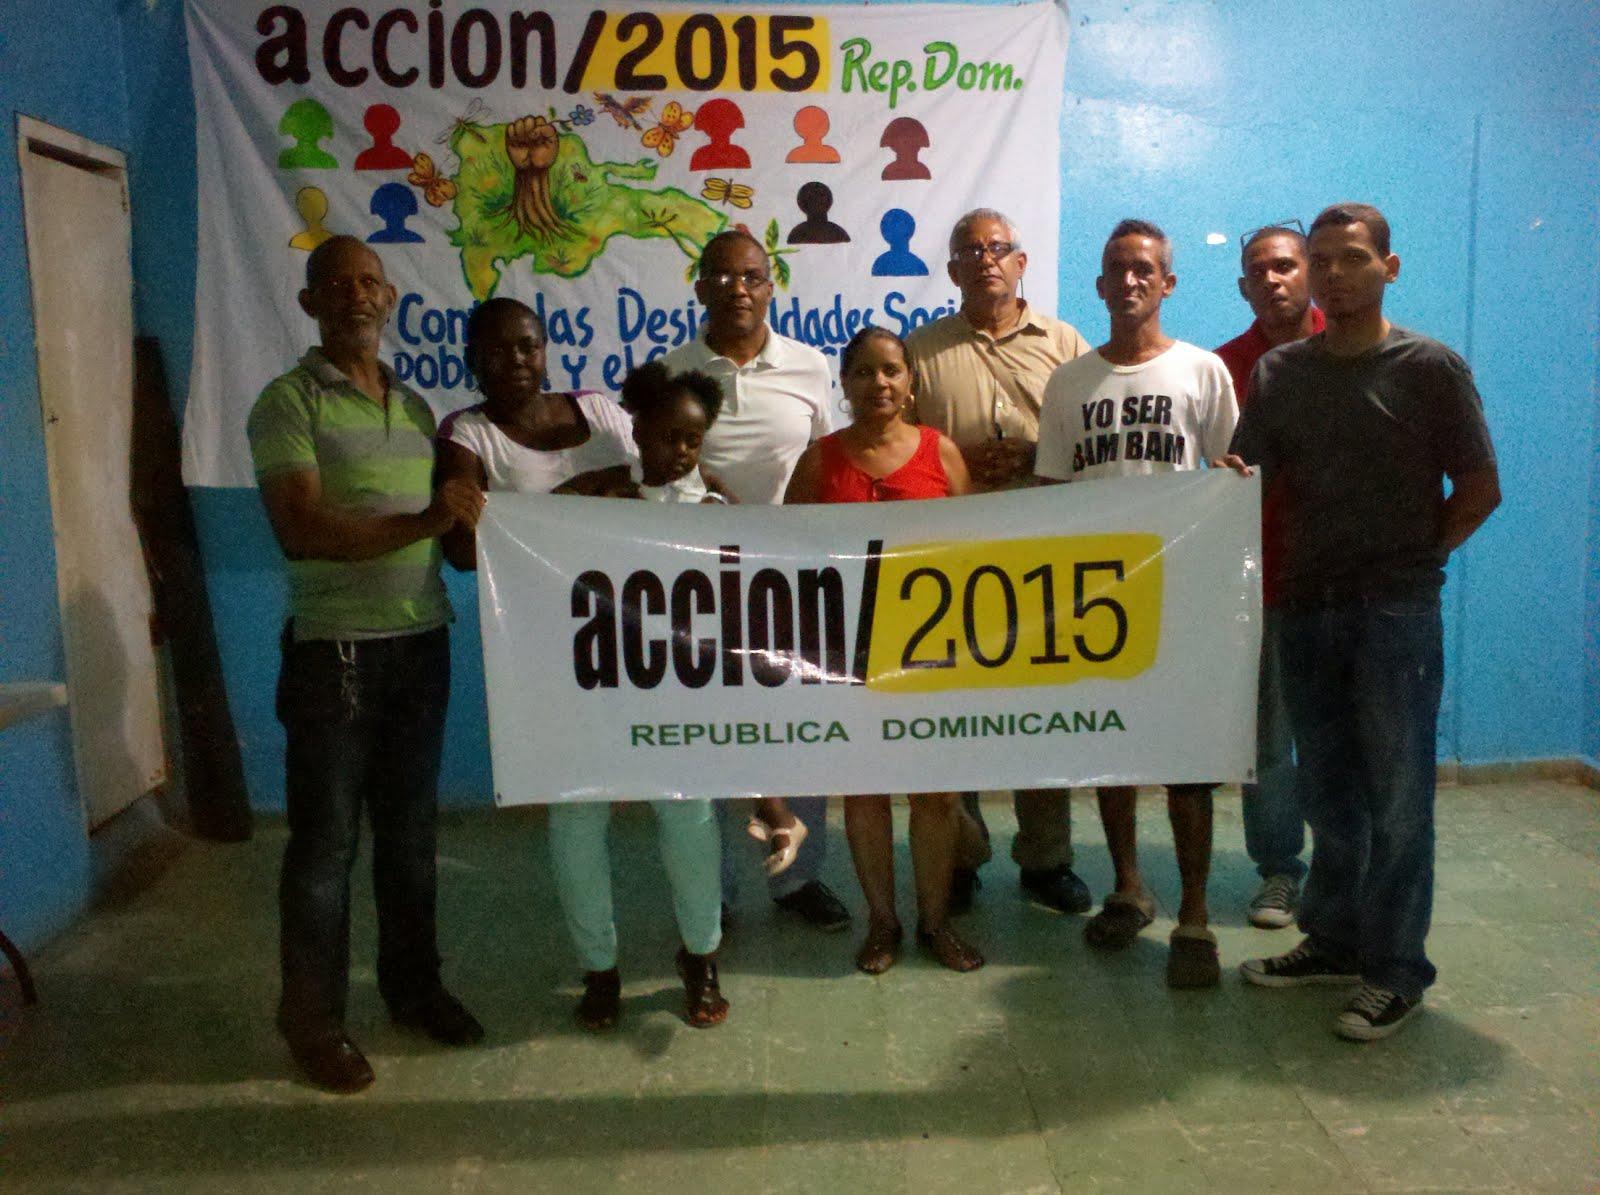 Acción/2015